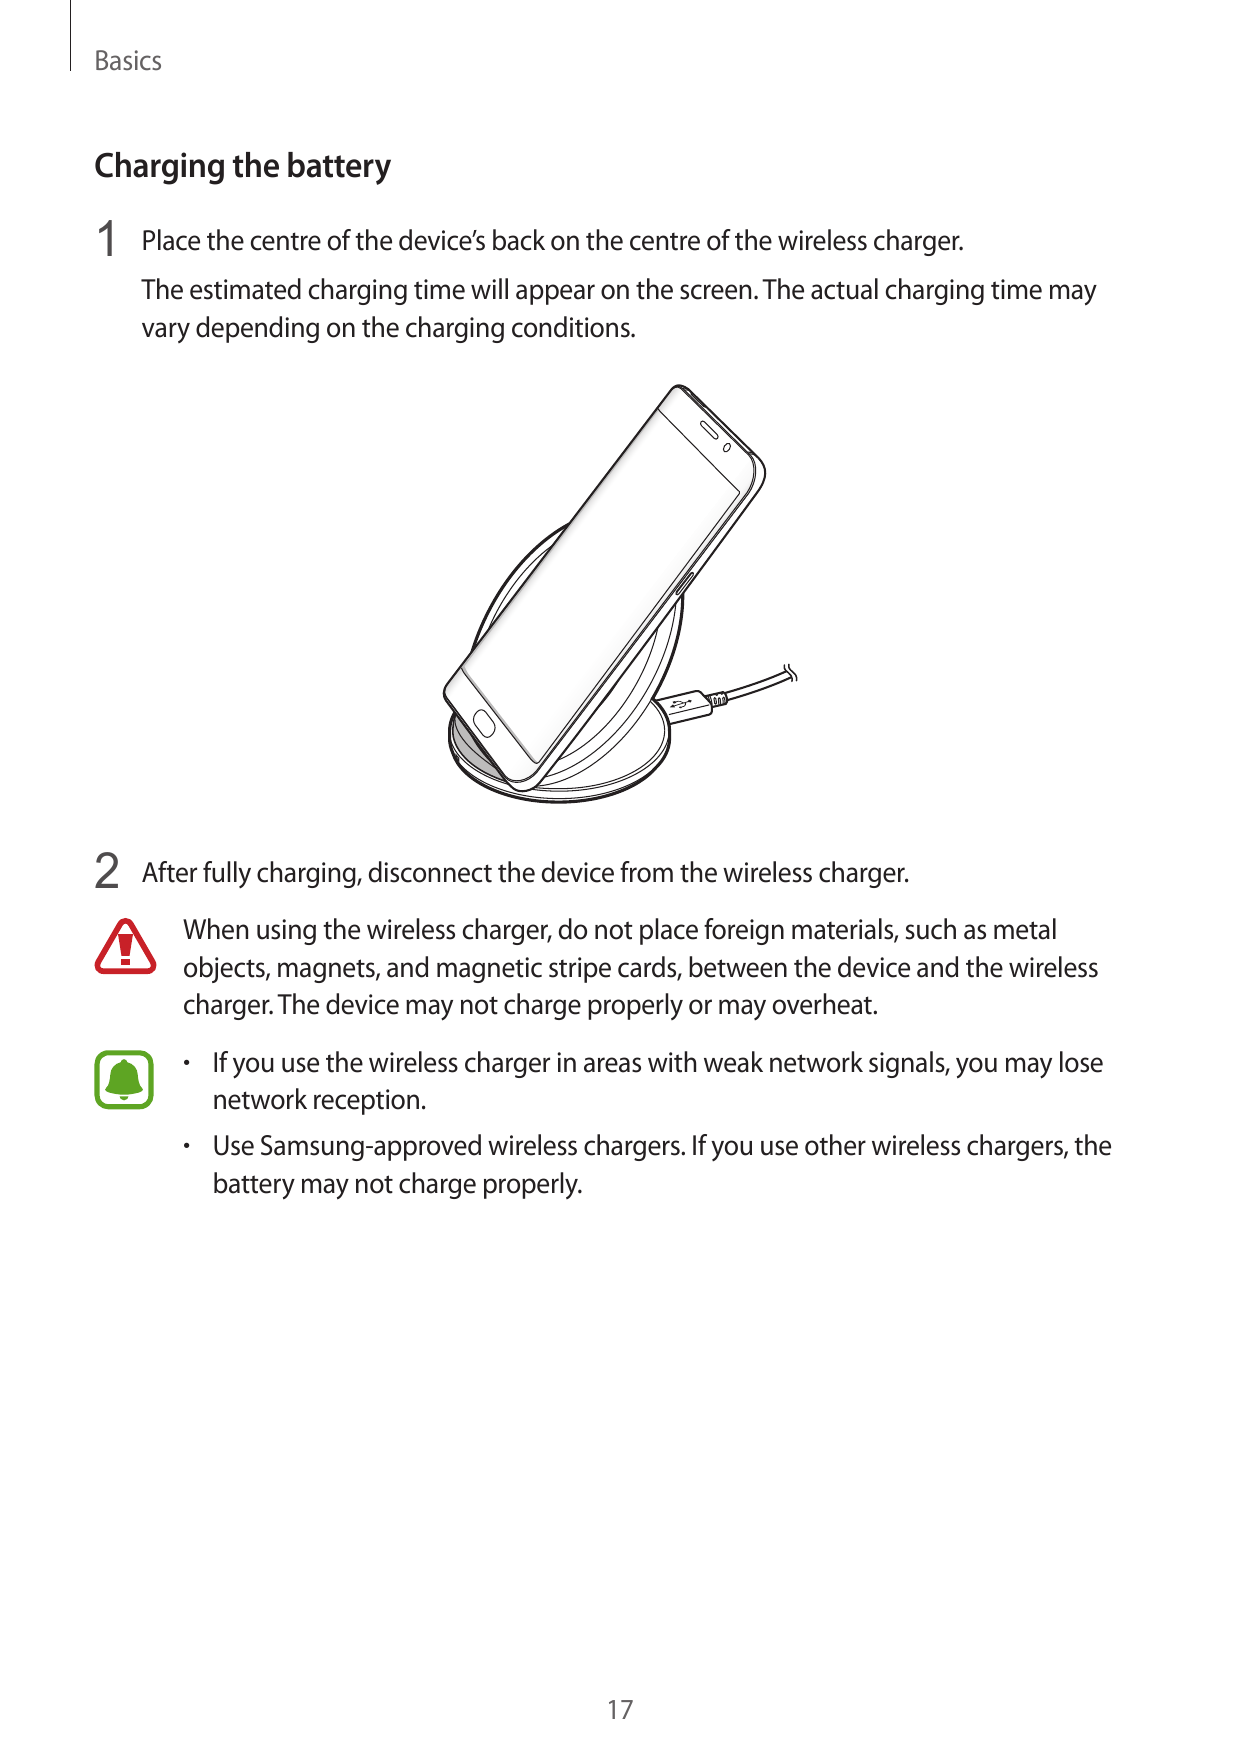 manual samsung galaxy s7 edge android 7 0 device guides rh helpforsmartphone com Samsung TV Schematics Samsung Refrigerator Troubleshooting Guide